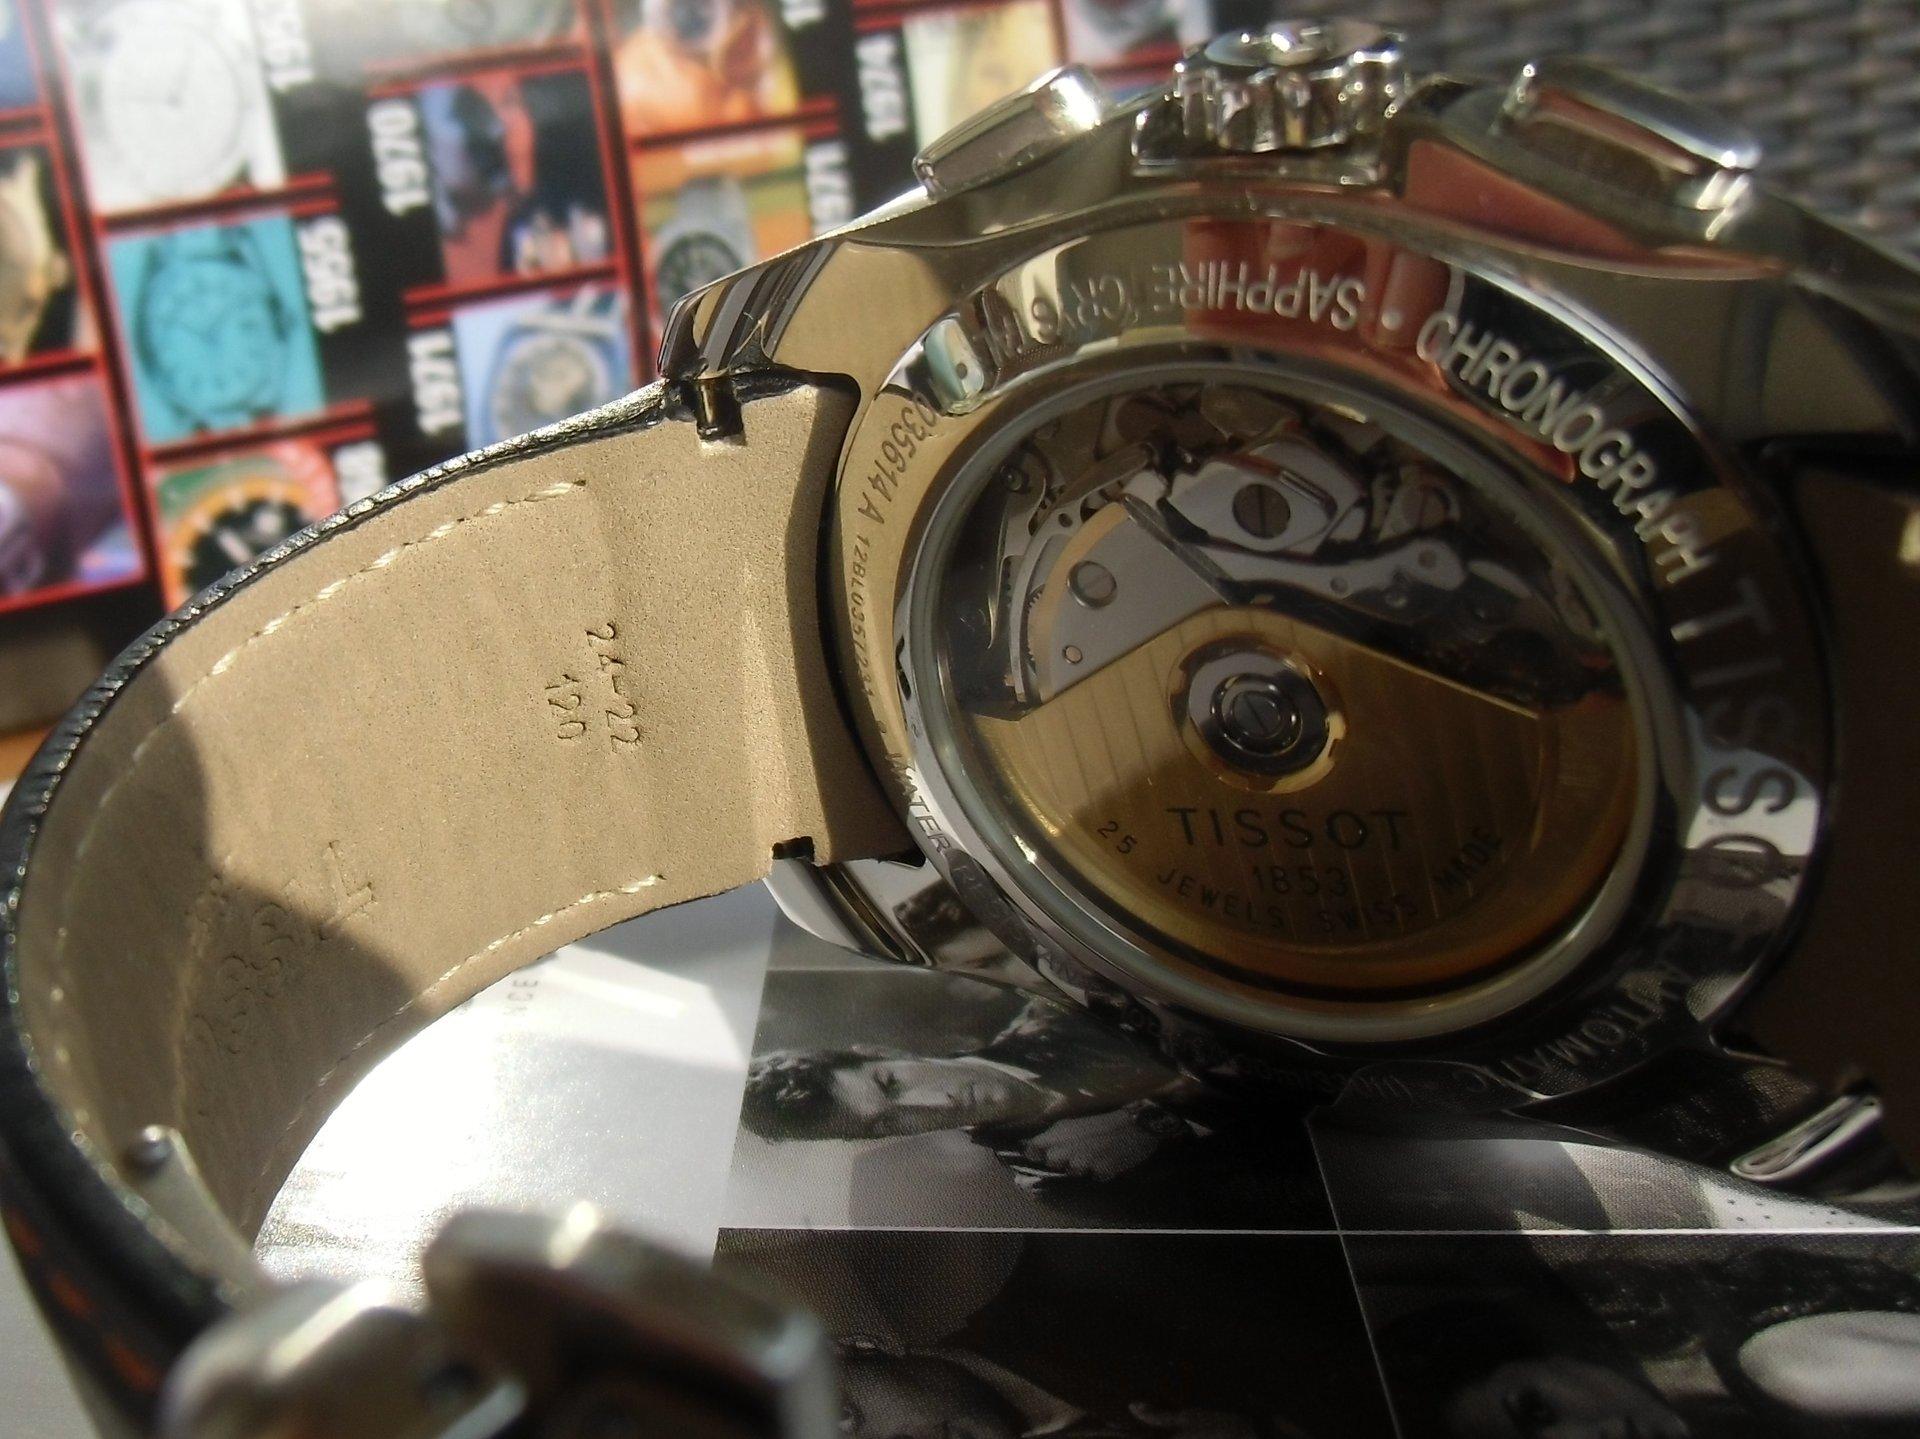 erledigt tissot couturier automatic chronograph valjoux. Black Bedroom Furniture Sets. Home Design Ideas